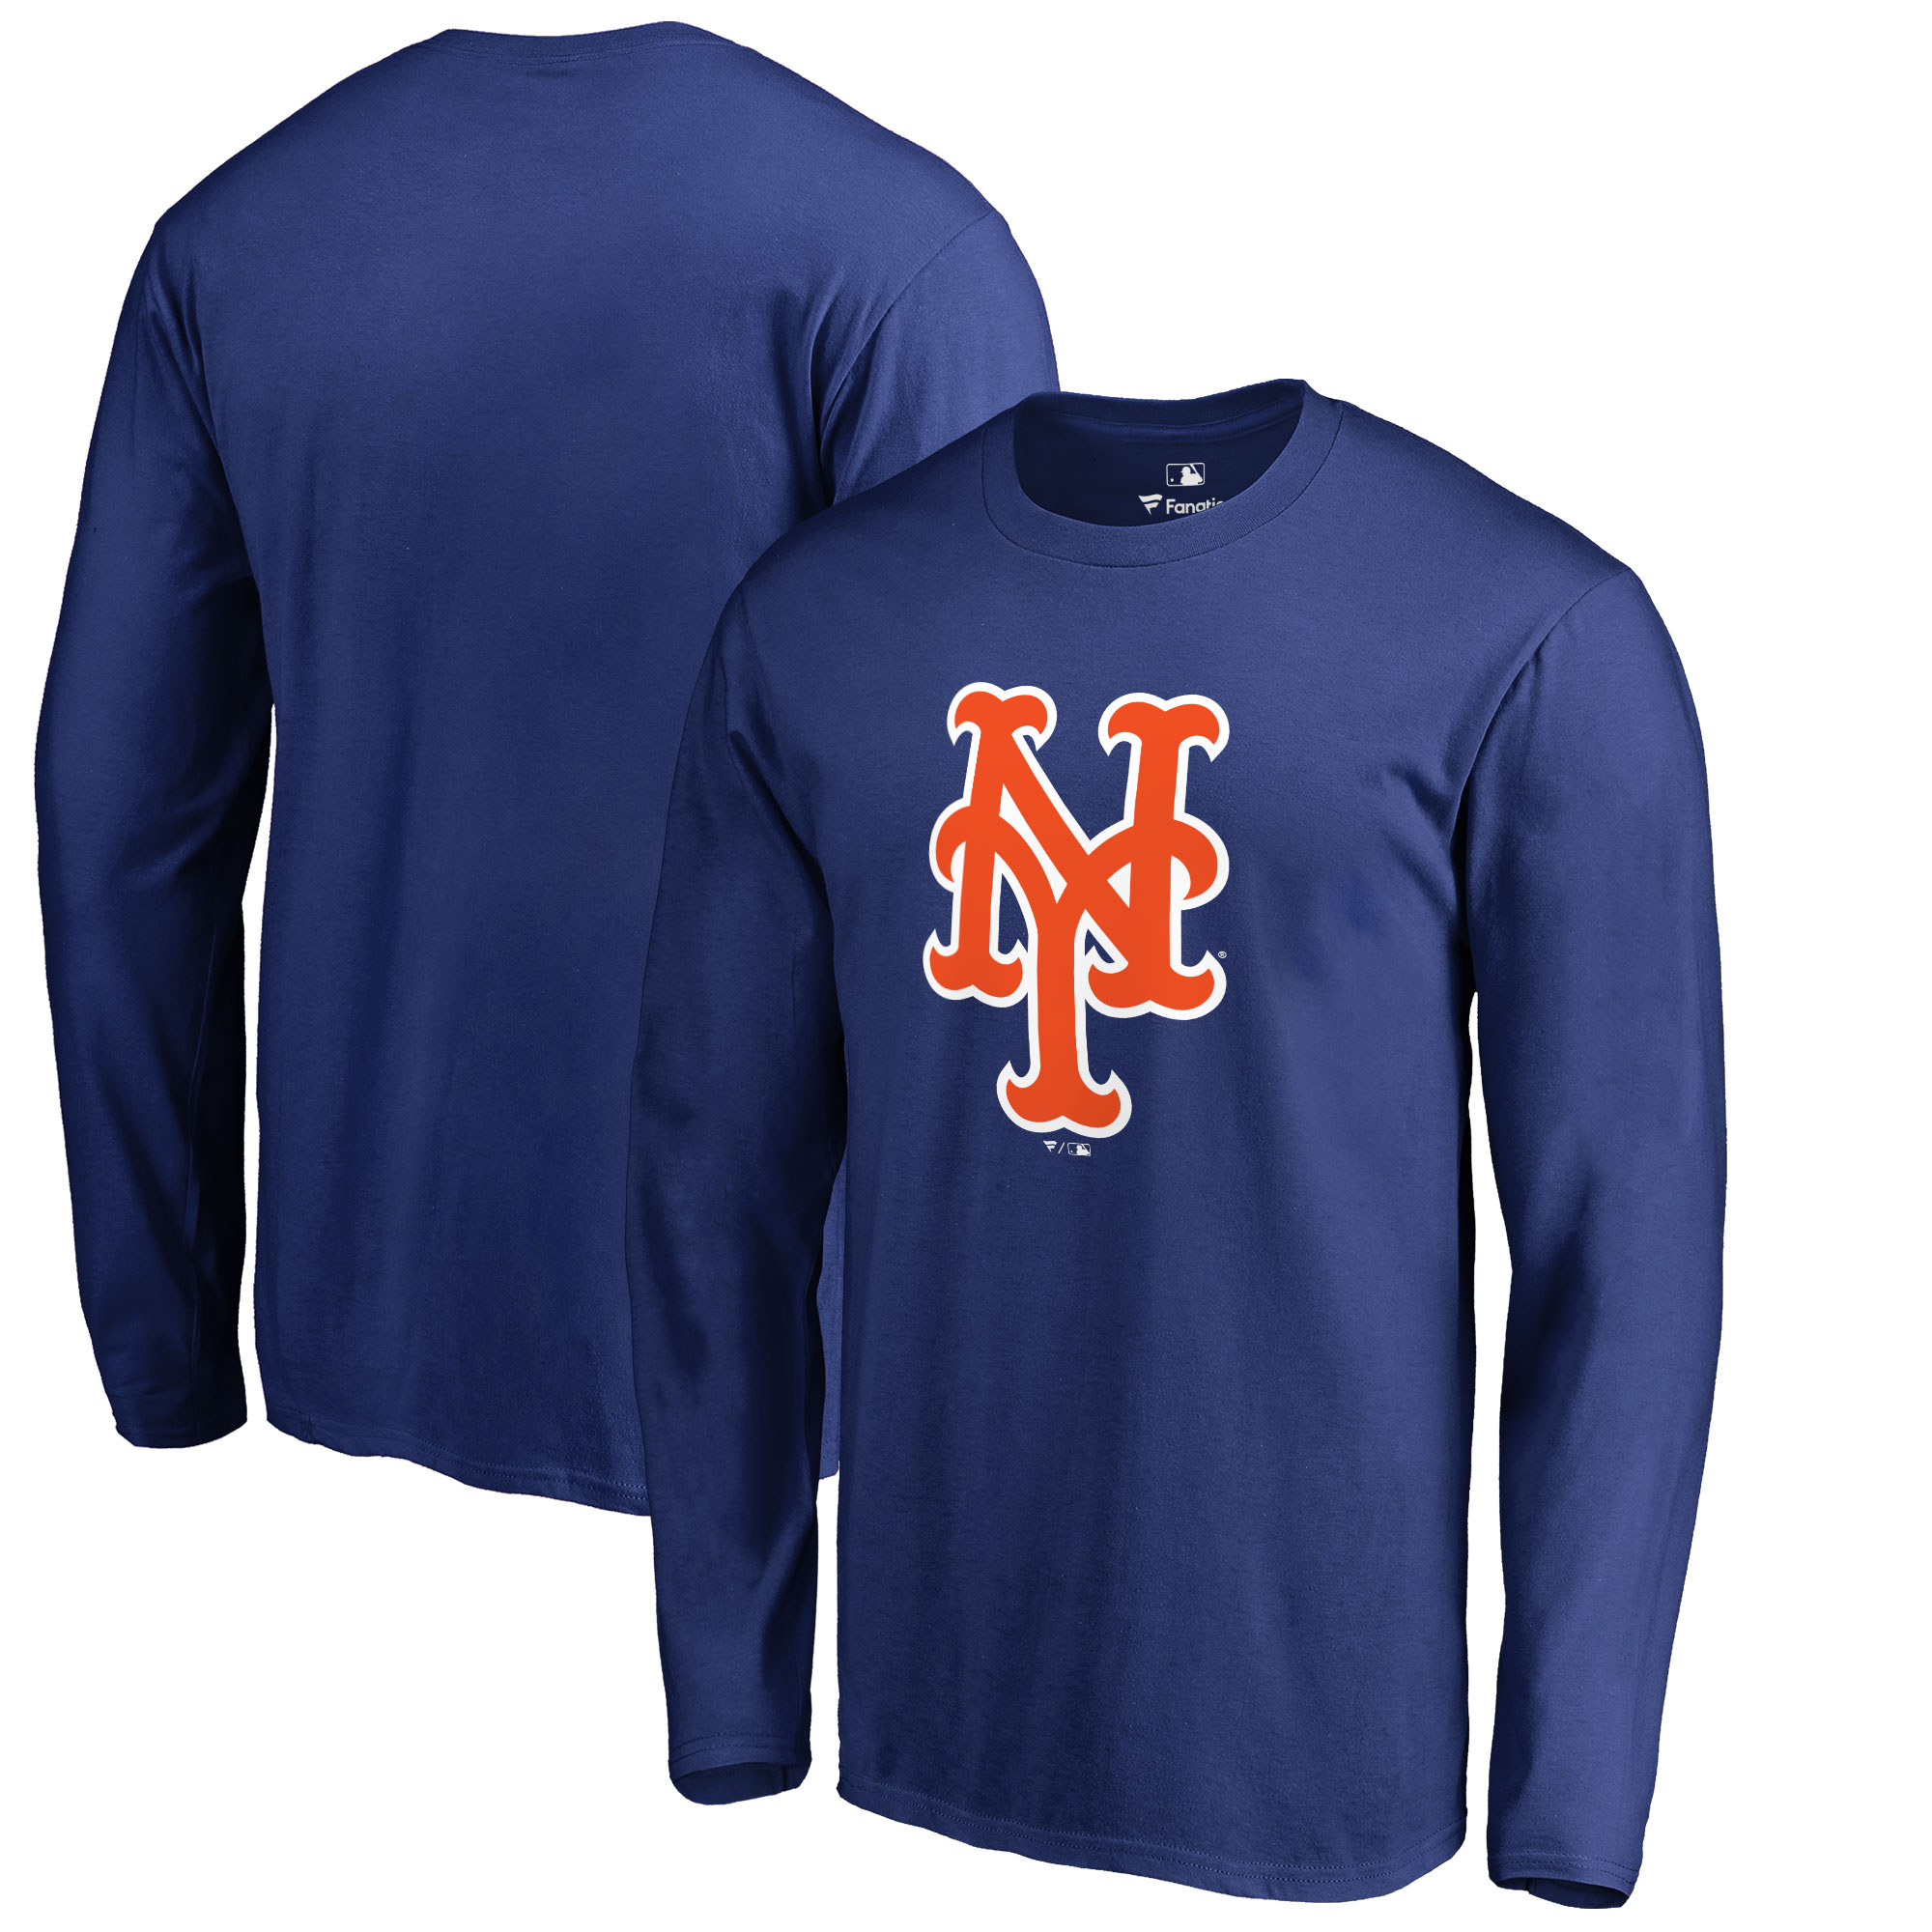 New York Mets Big & Tall Primary Team Logo Long Sleeve T-Shirt - Royal